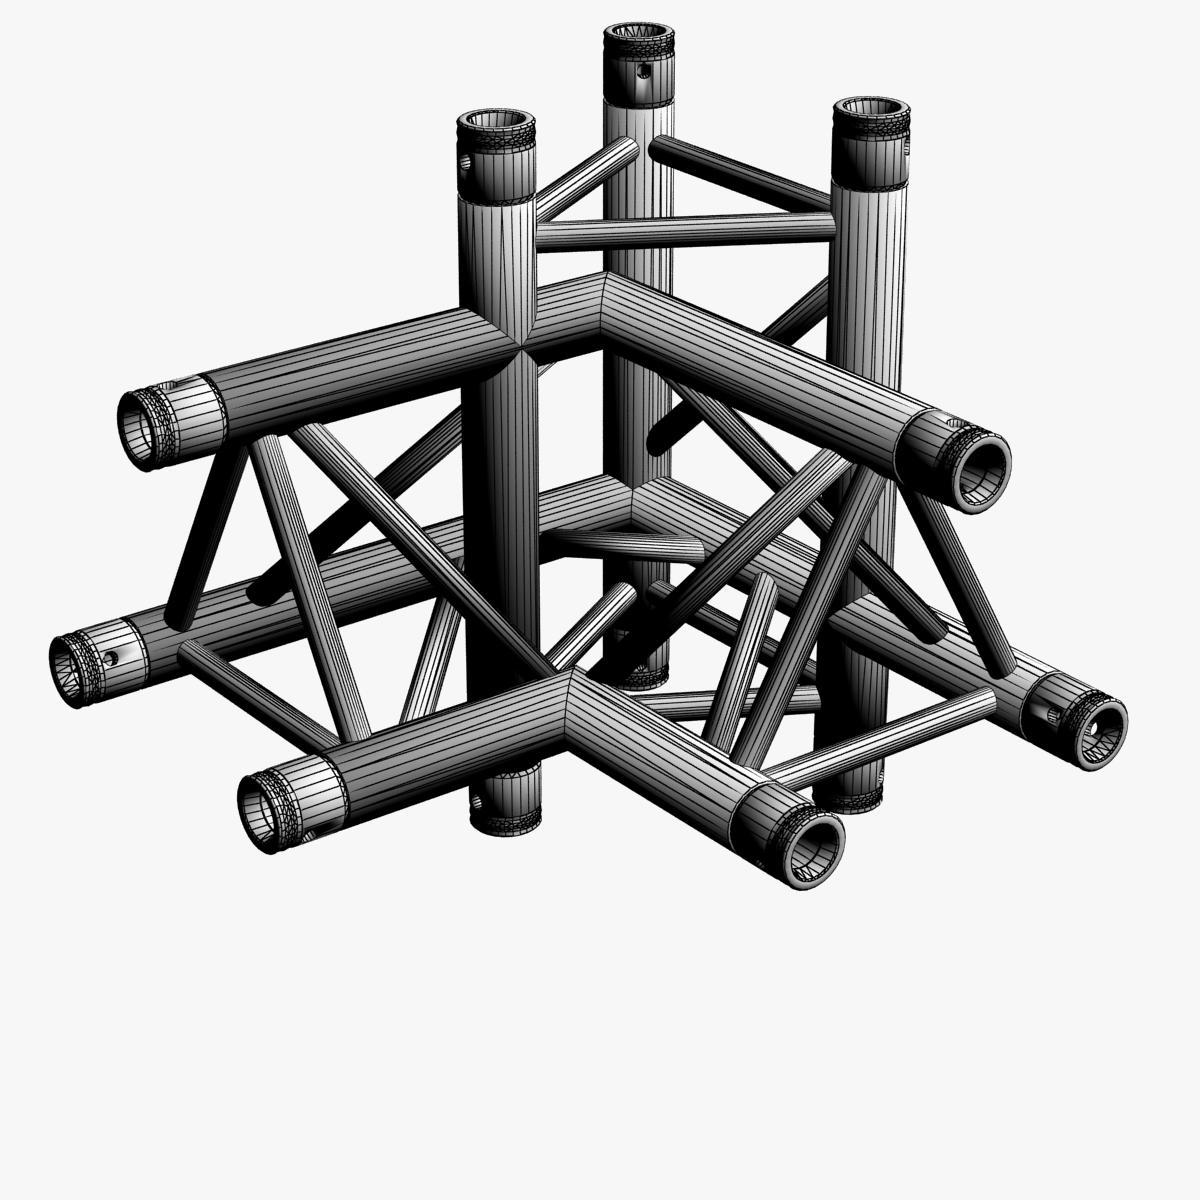 Triangular Truss Corner Junction 102 3d model 3ds max dxf fbx b3d c4d  obj other 268933